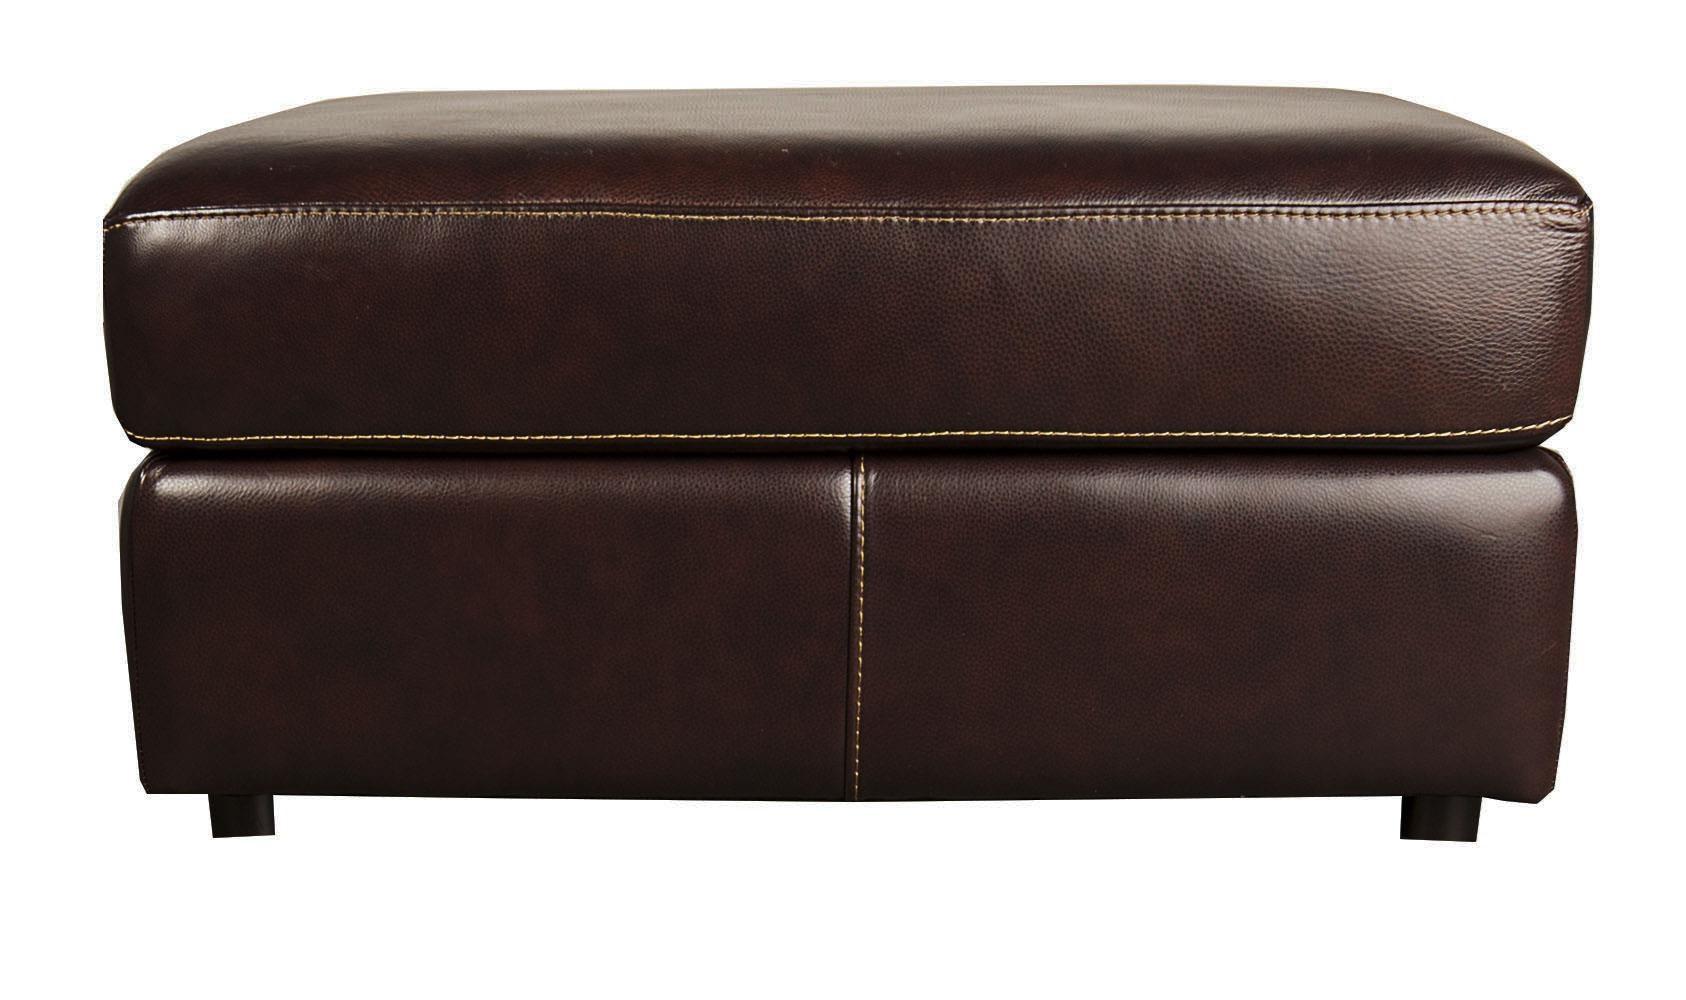 Bernhardt Winslow Winslow 100% Leather Ottoman - Item Number: 274776830